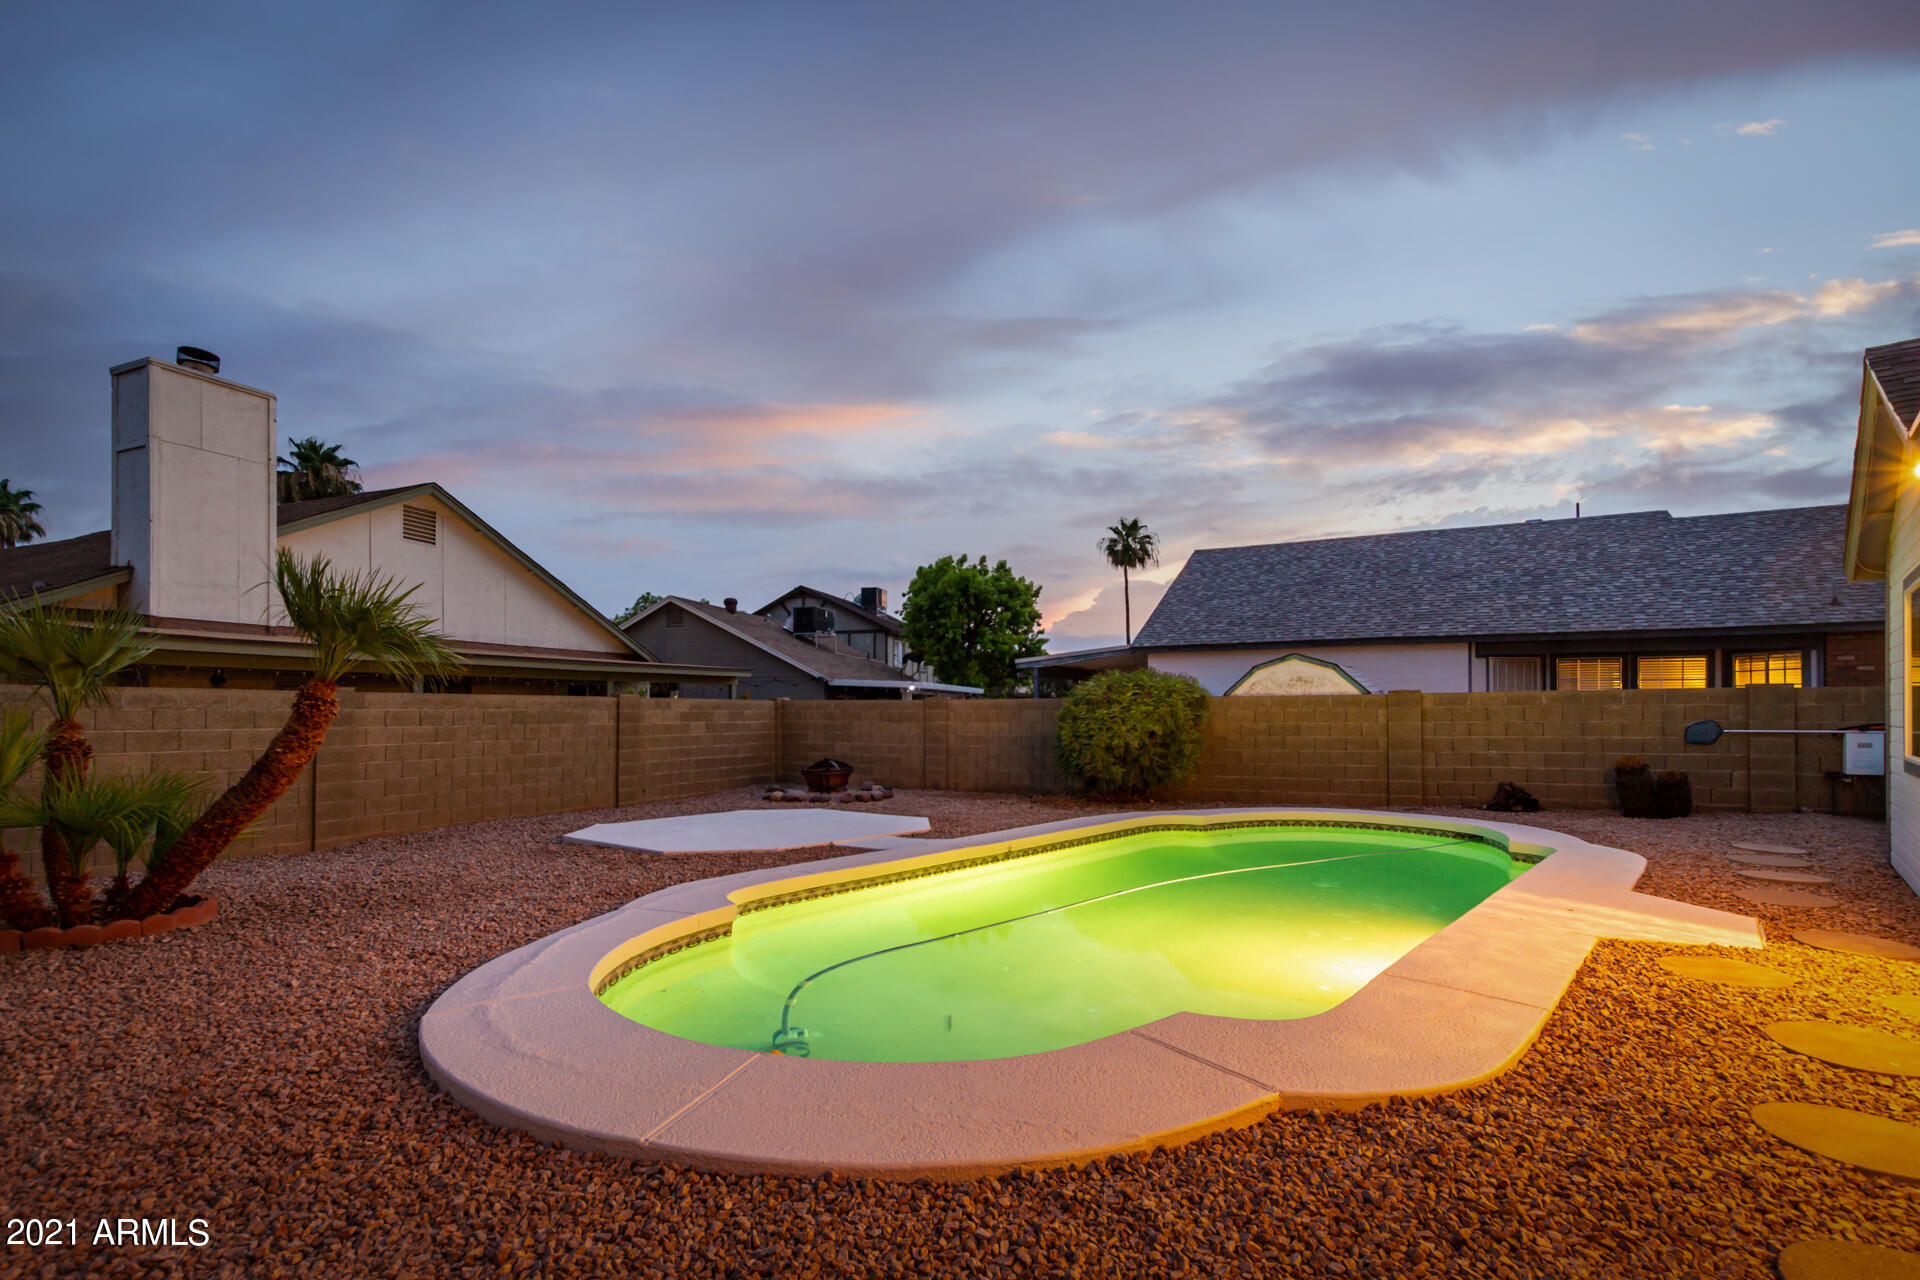 MLS 6266468 3458 N VERANO Court, Chandler, AZ 85224 Chandler AZ Private Pool